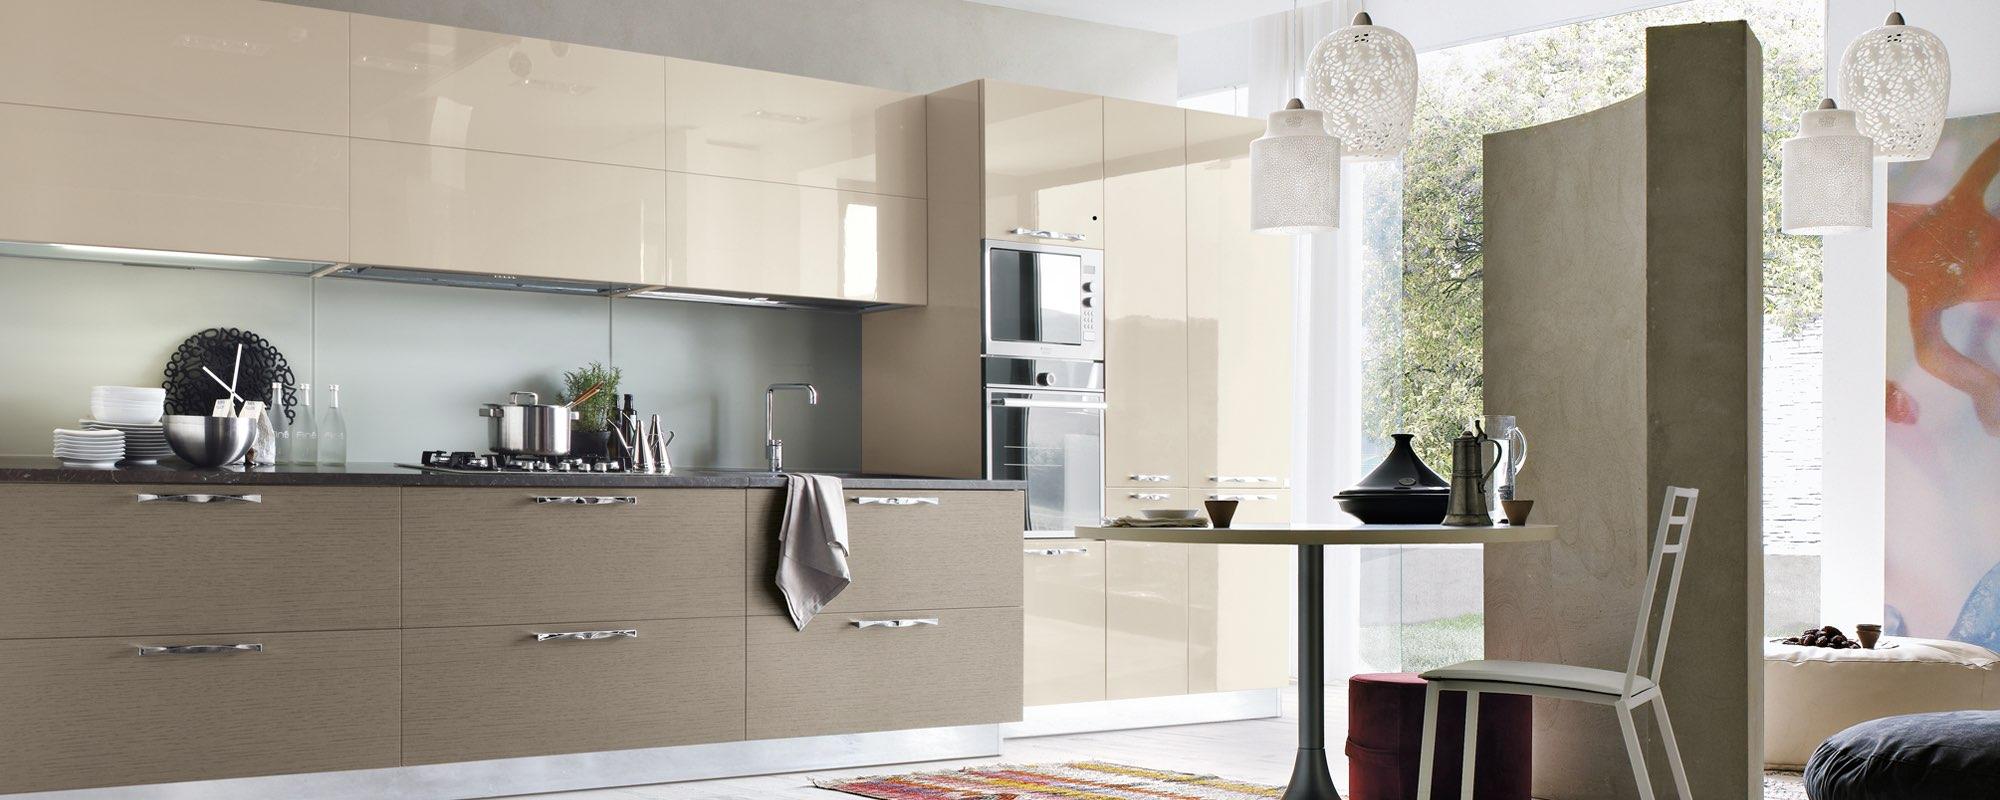 vista di laterale di una cucina moderna in legno laccata - LIFE